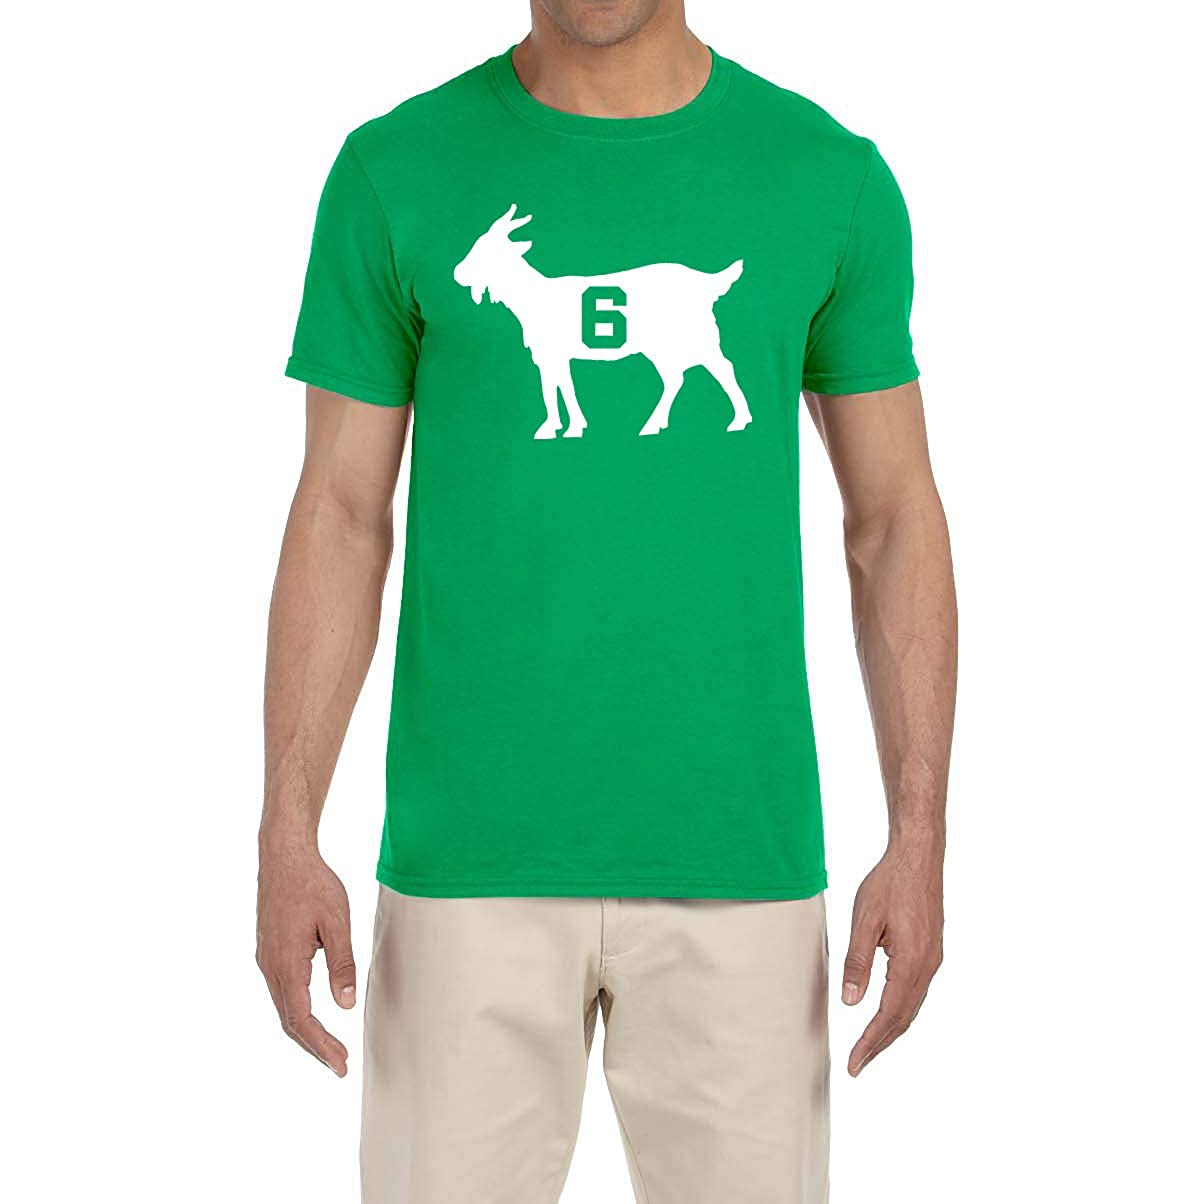 Peg Leg Shirts GREEN Boston Russell Goat T-Shirt